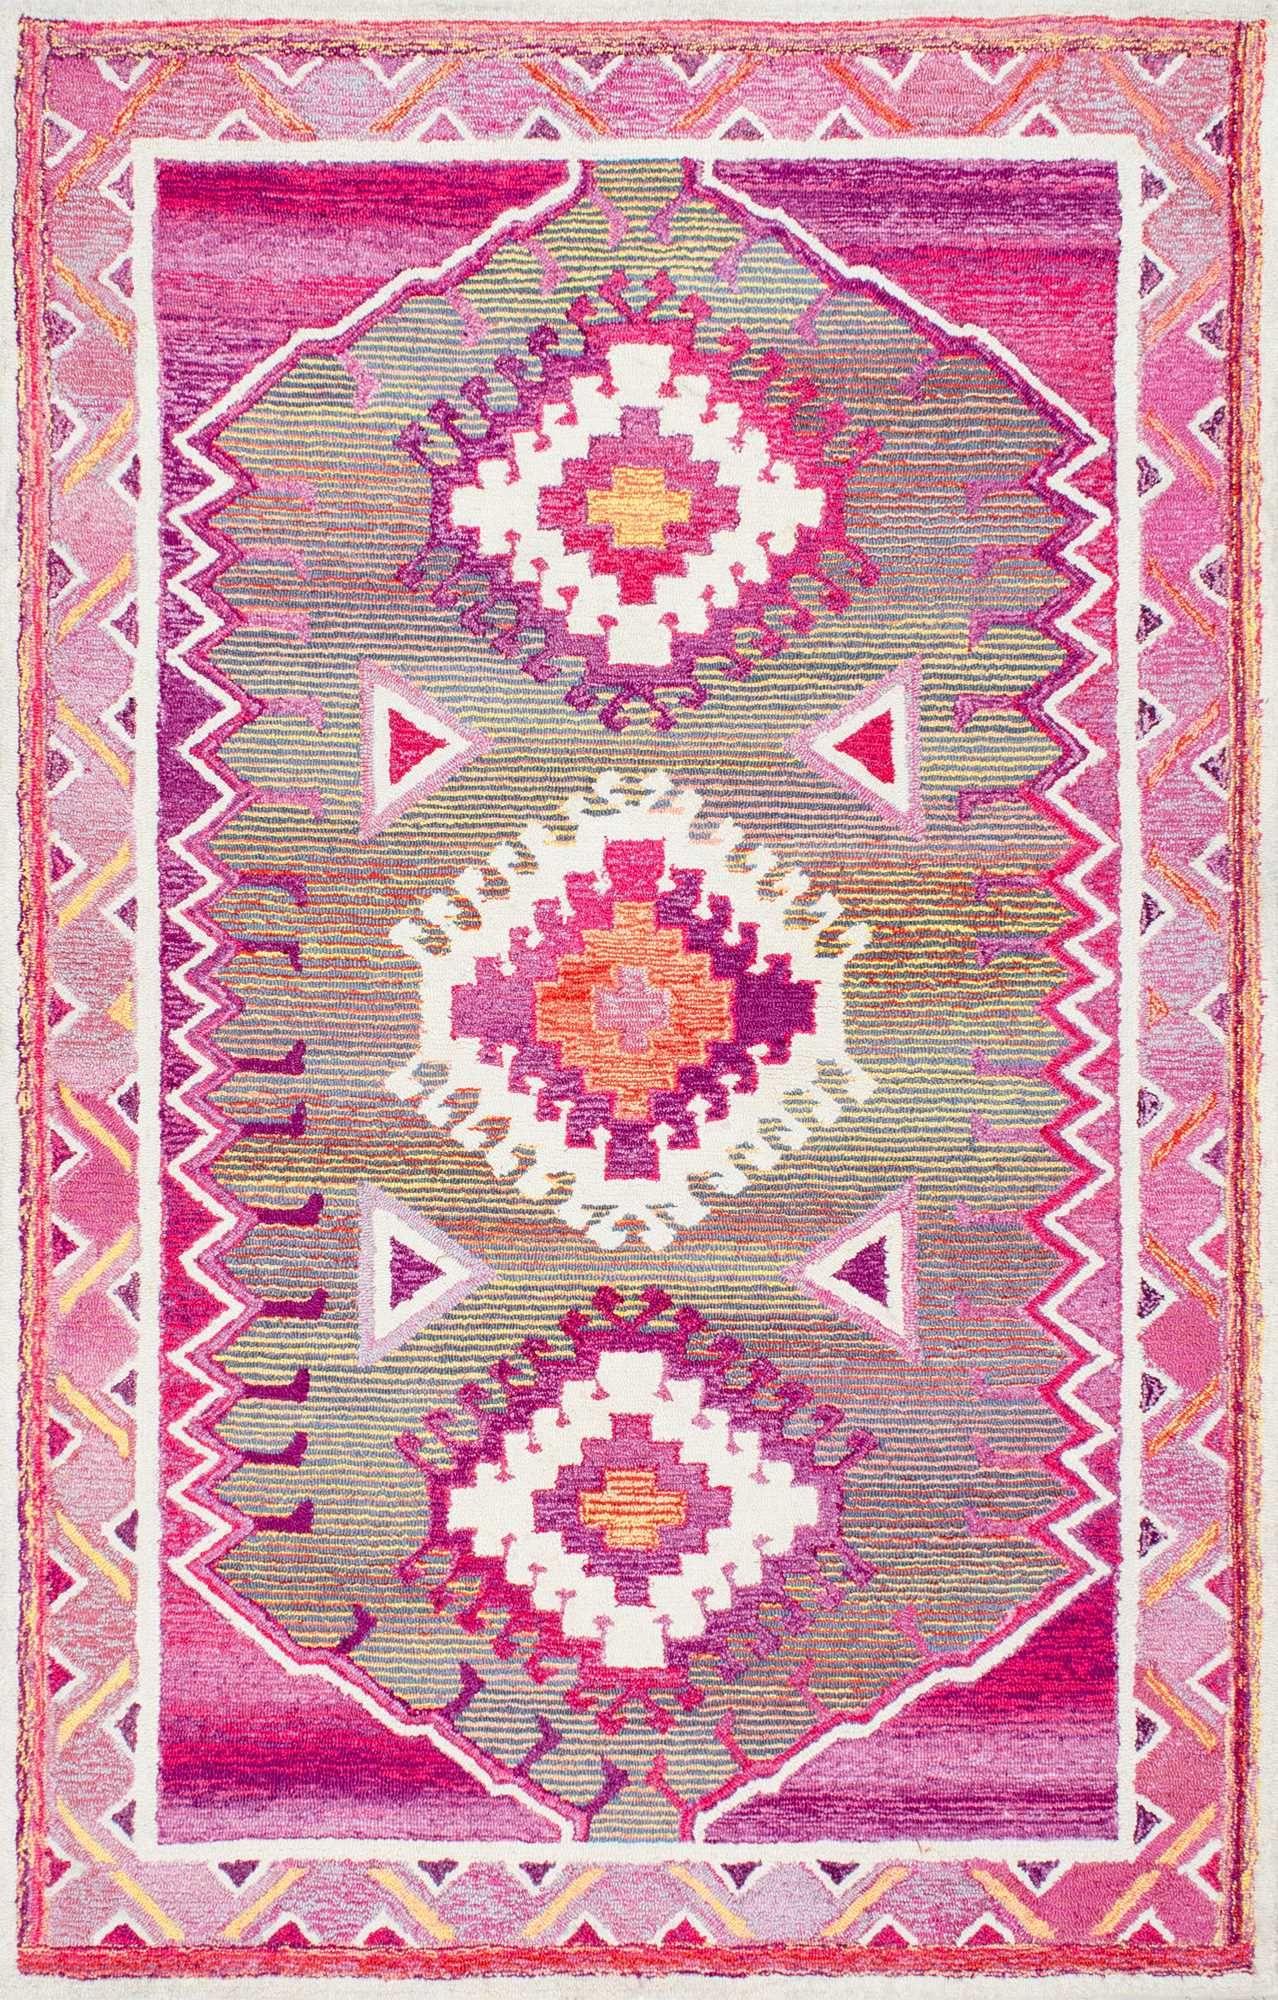 bavodamoroccan diamond pole rug | runners, style and shag rugs